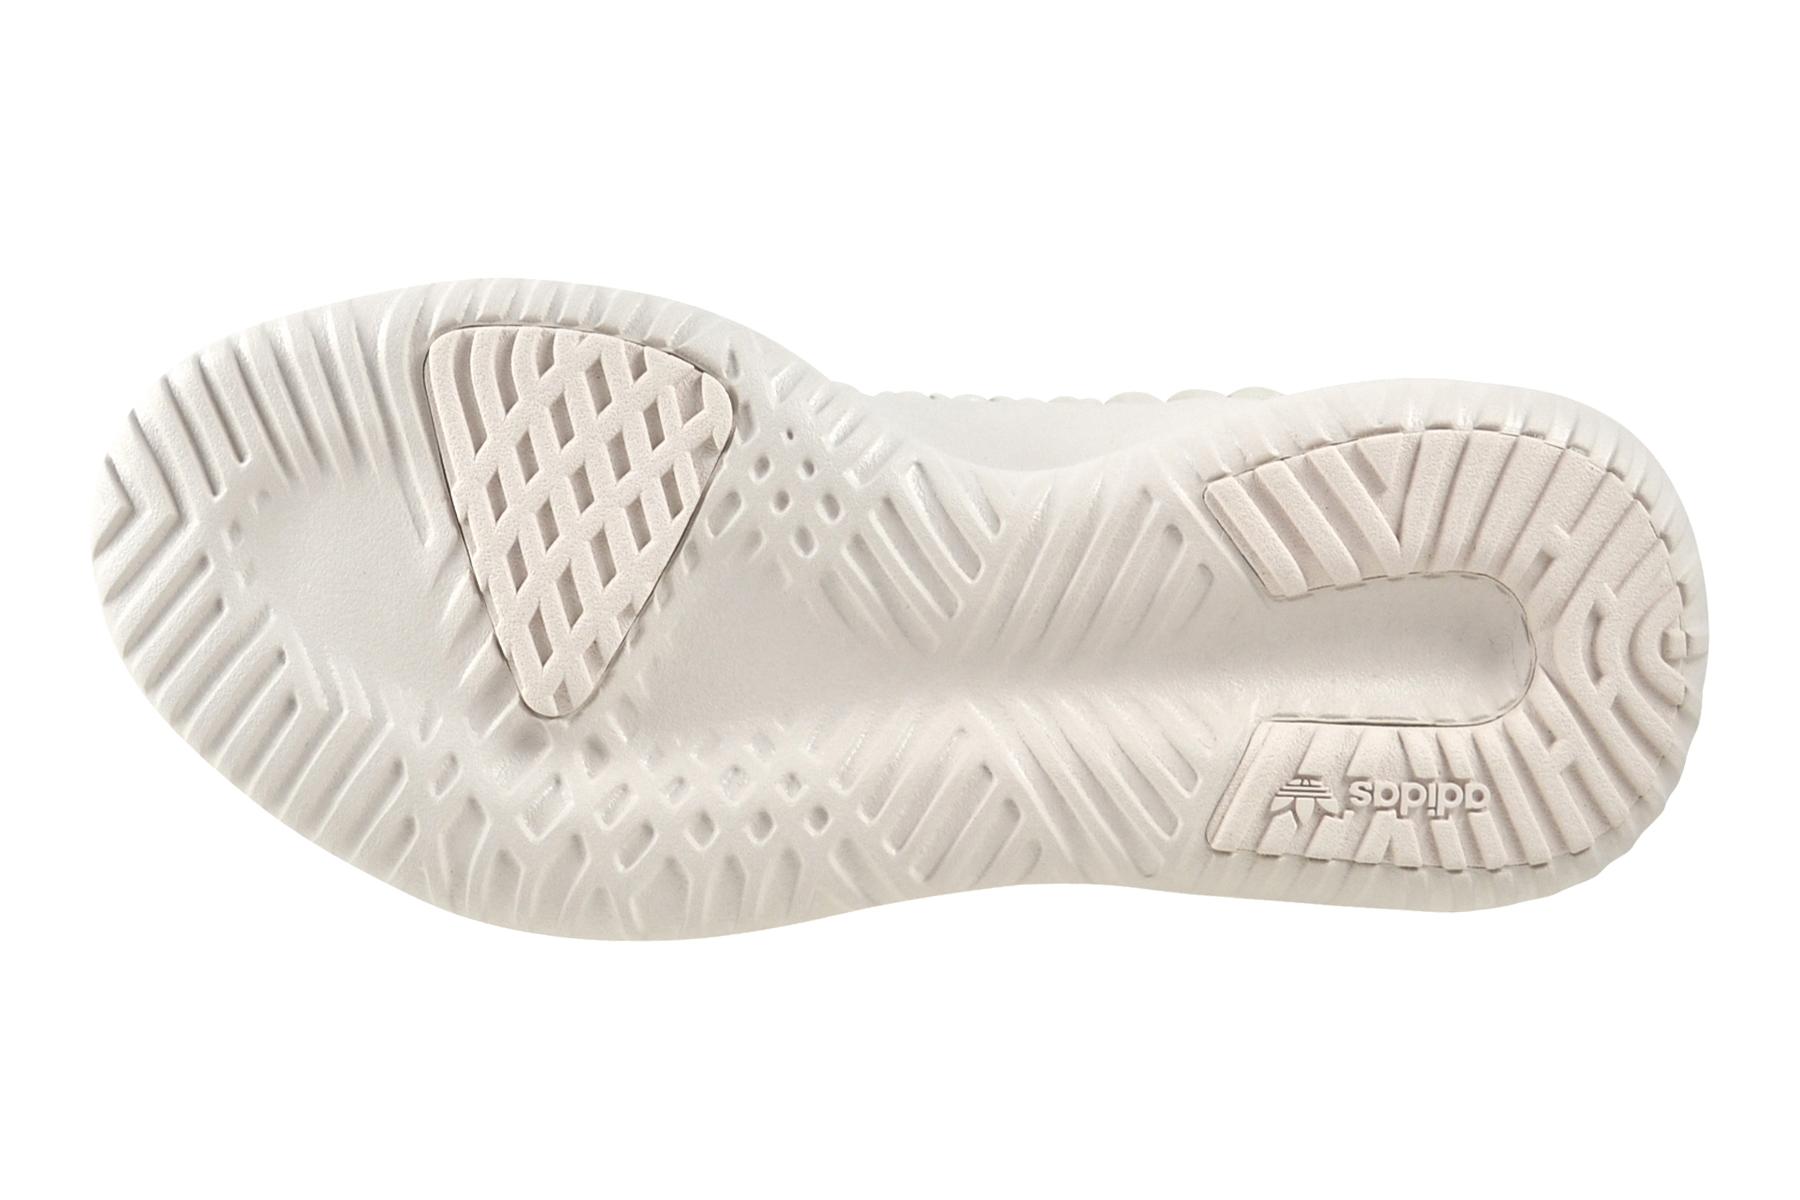 adidas spezial braun, adidas Originals TUBULAR SHADOW